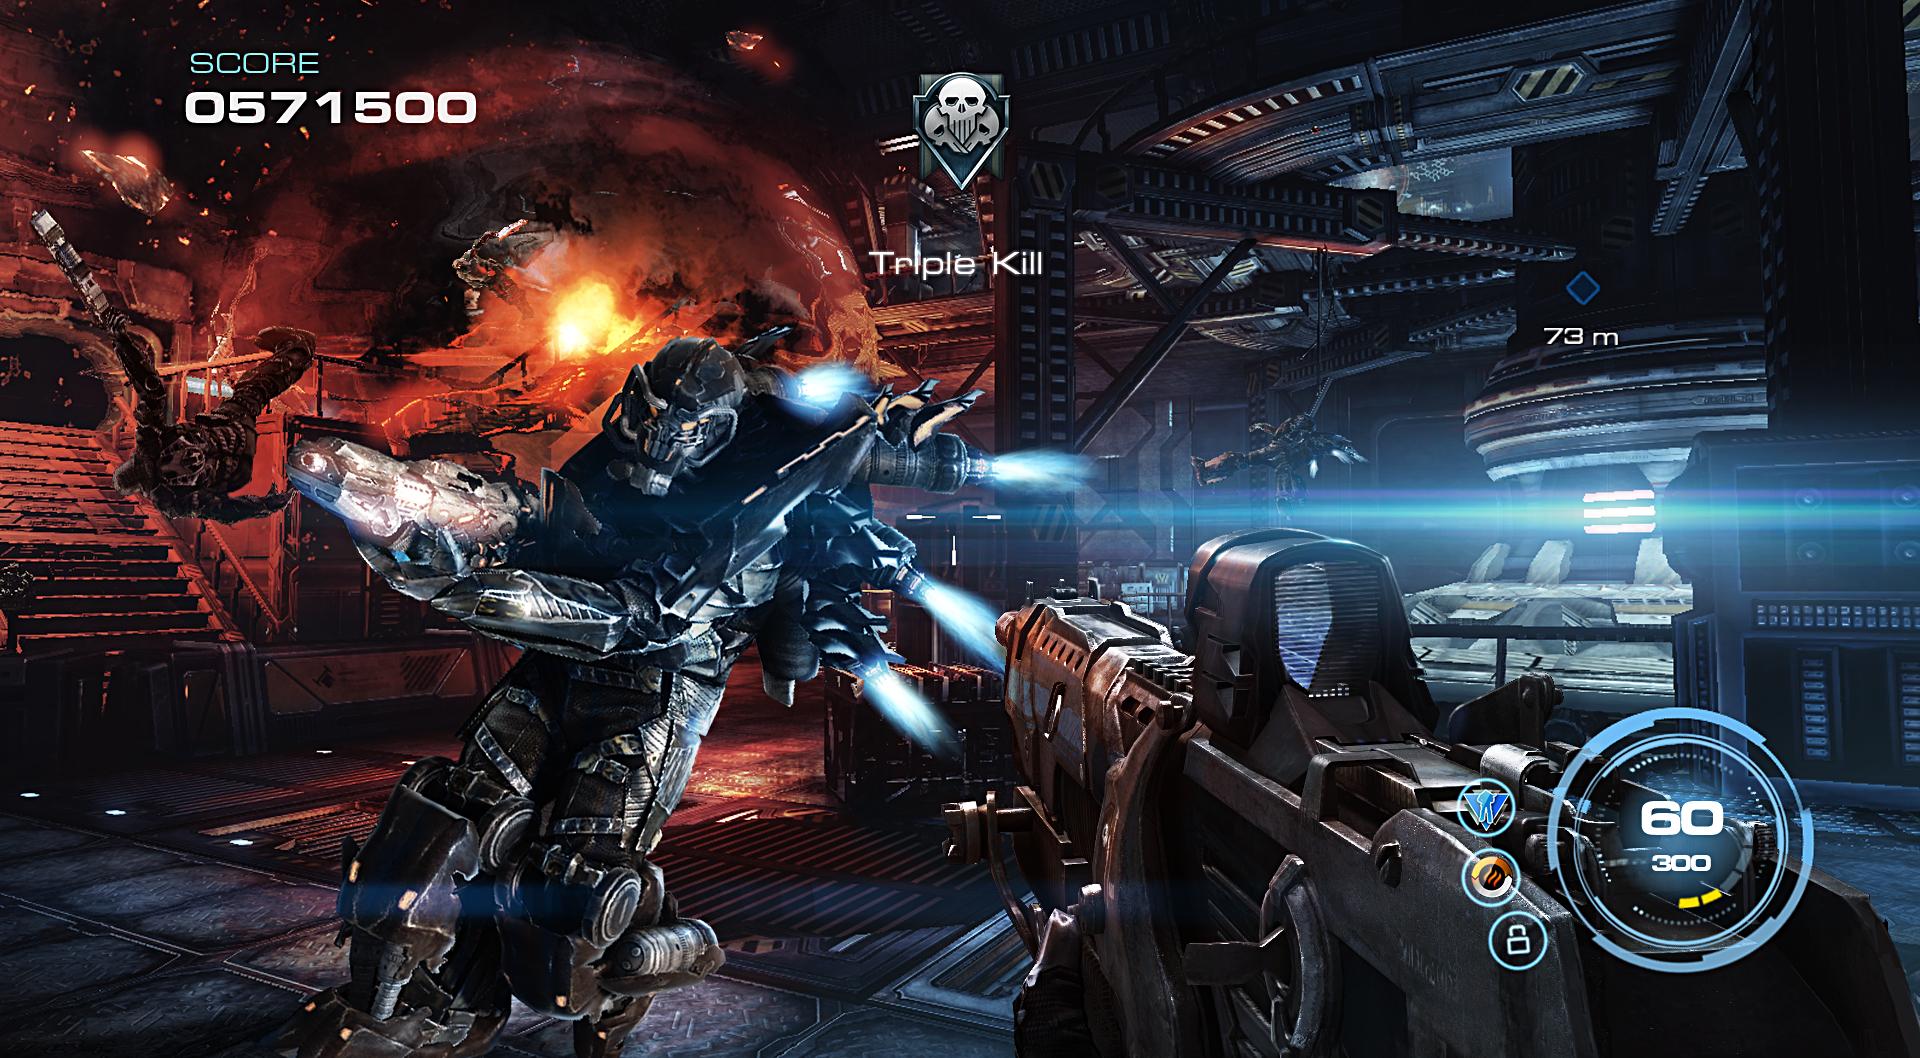 KHAiHOM.com - Alien Rage - Unlimited